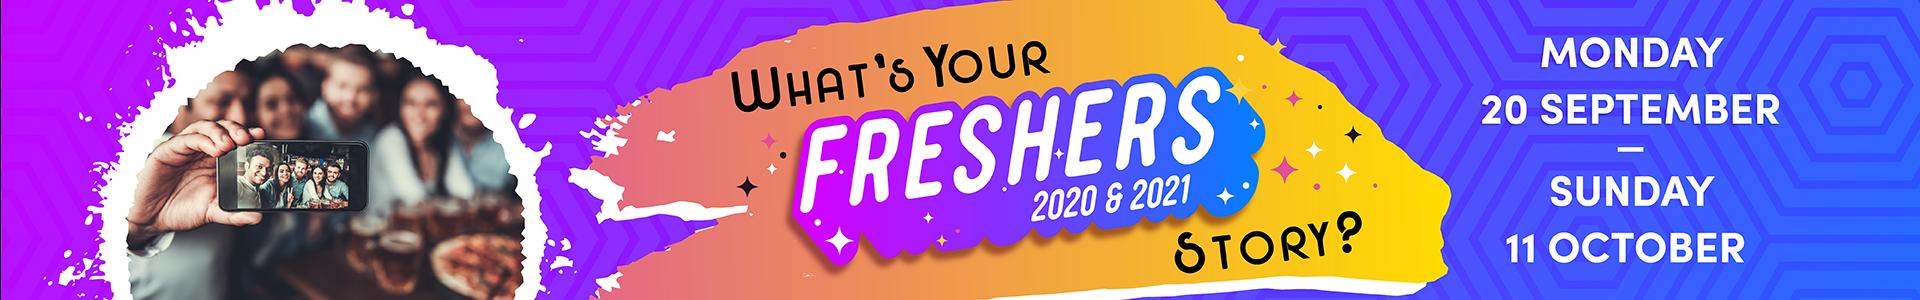 Freshers' 2021